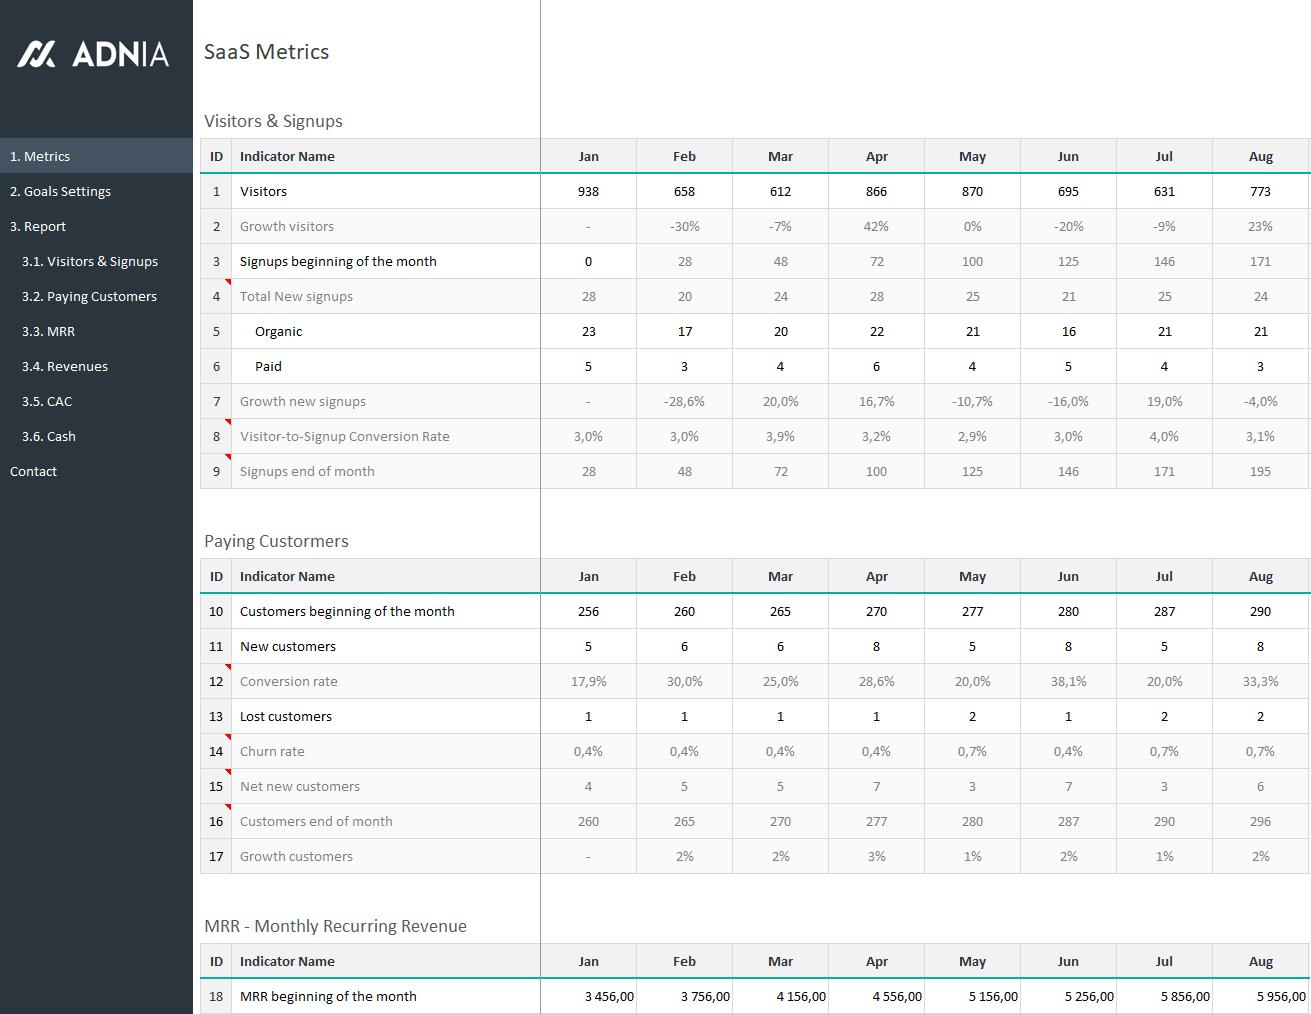 Saas Metrics Spreadsheet For Saas Metrics Template  Saas Metrics Dashboard Template  Adnia